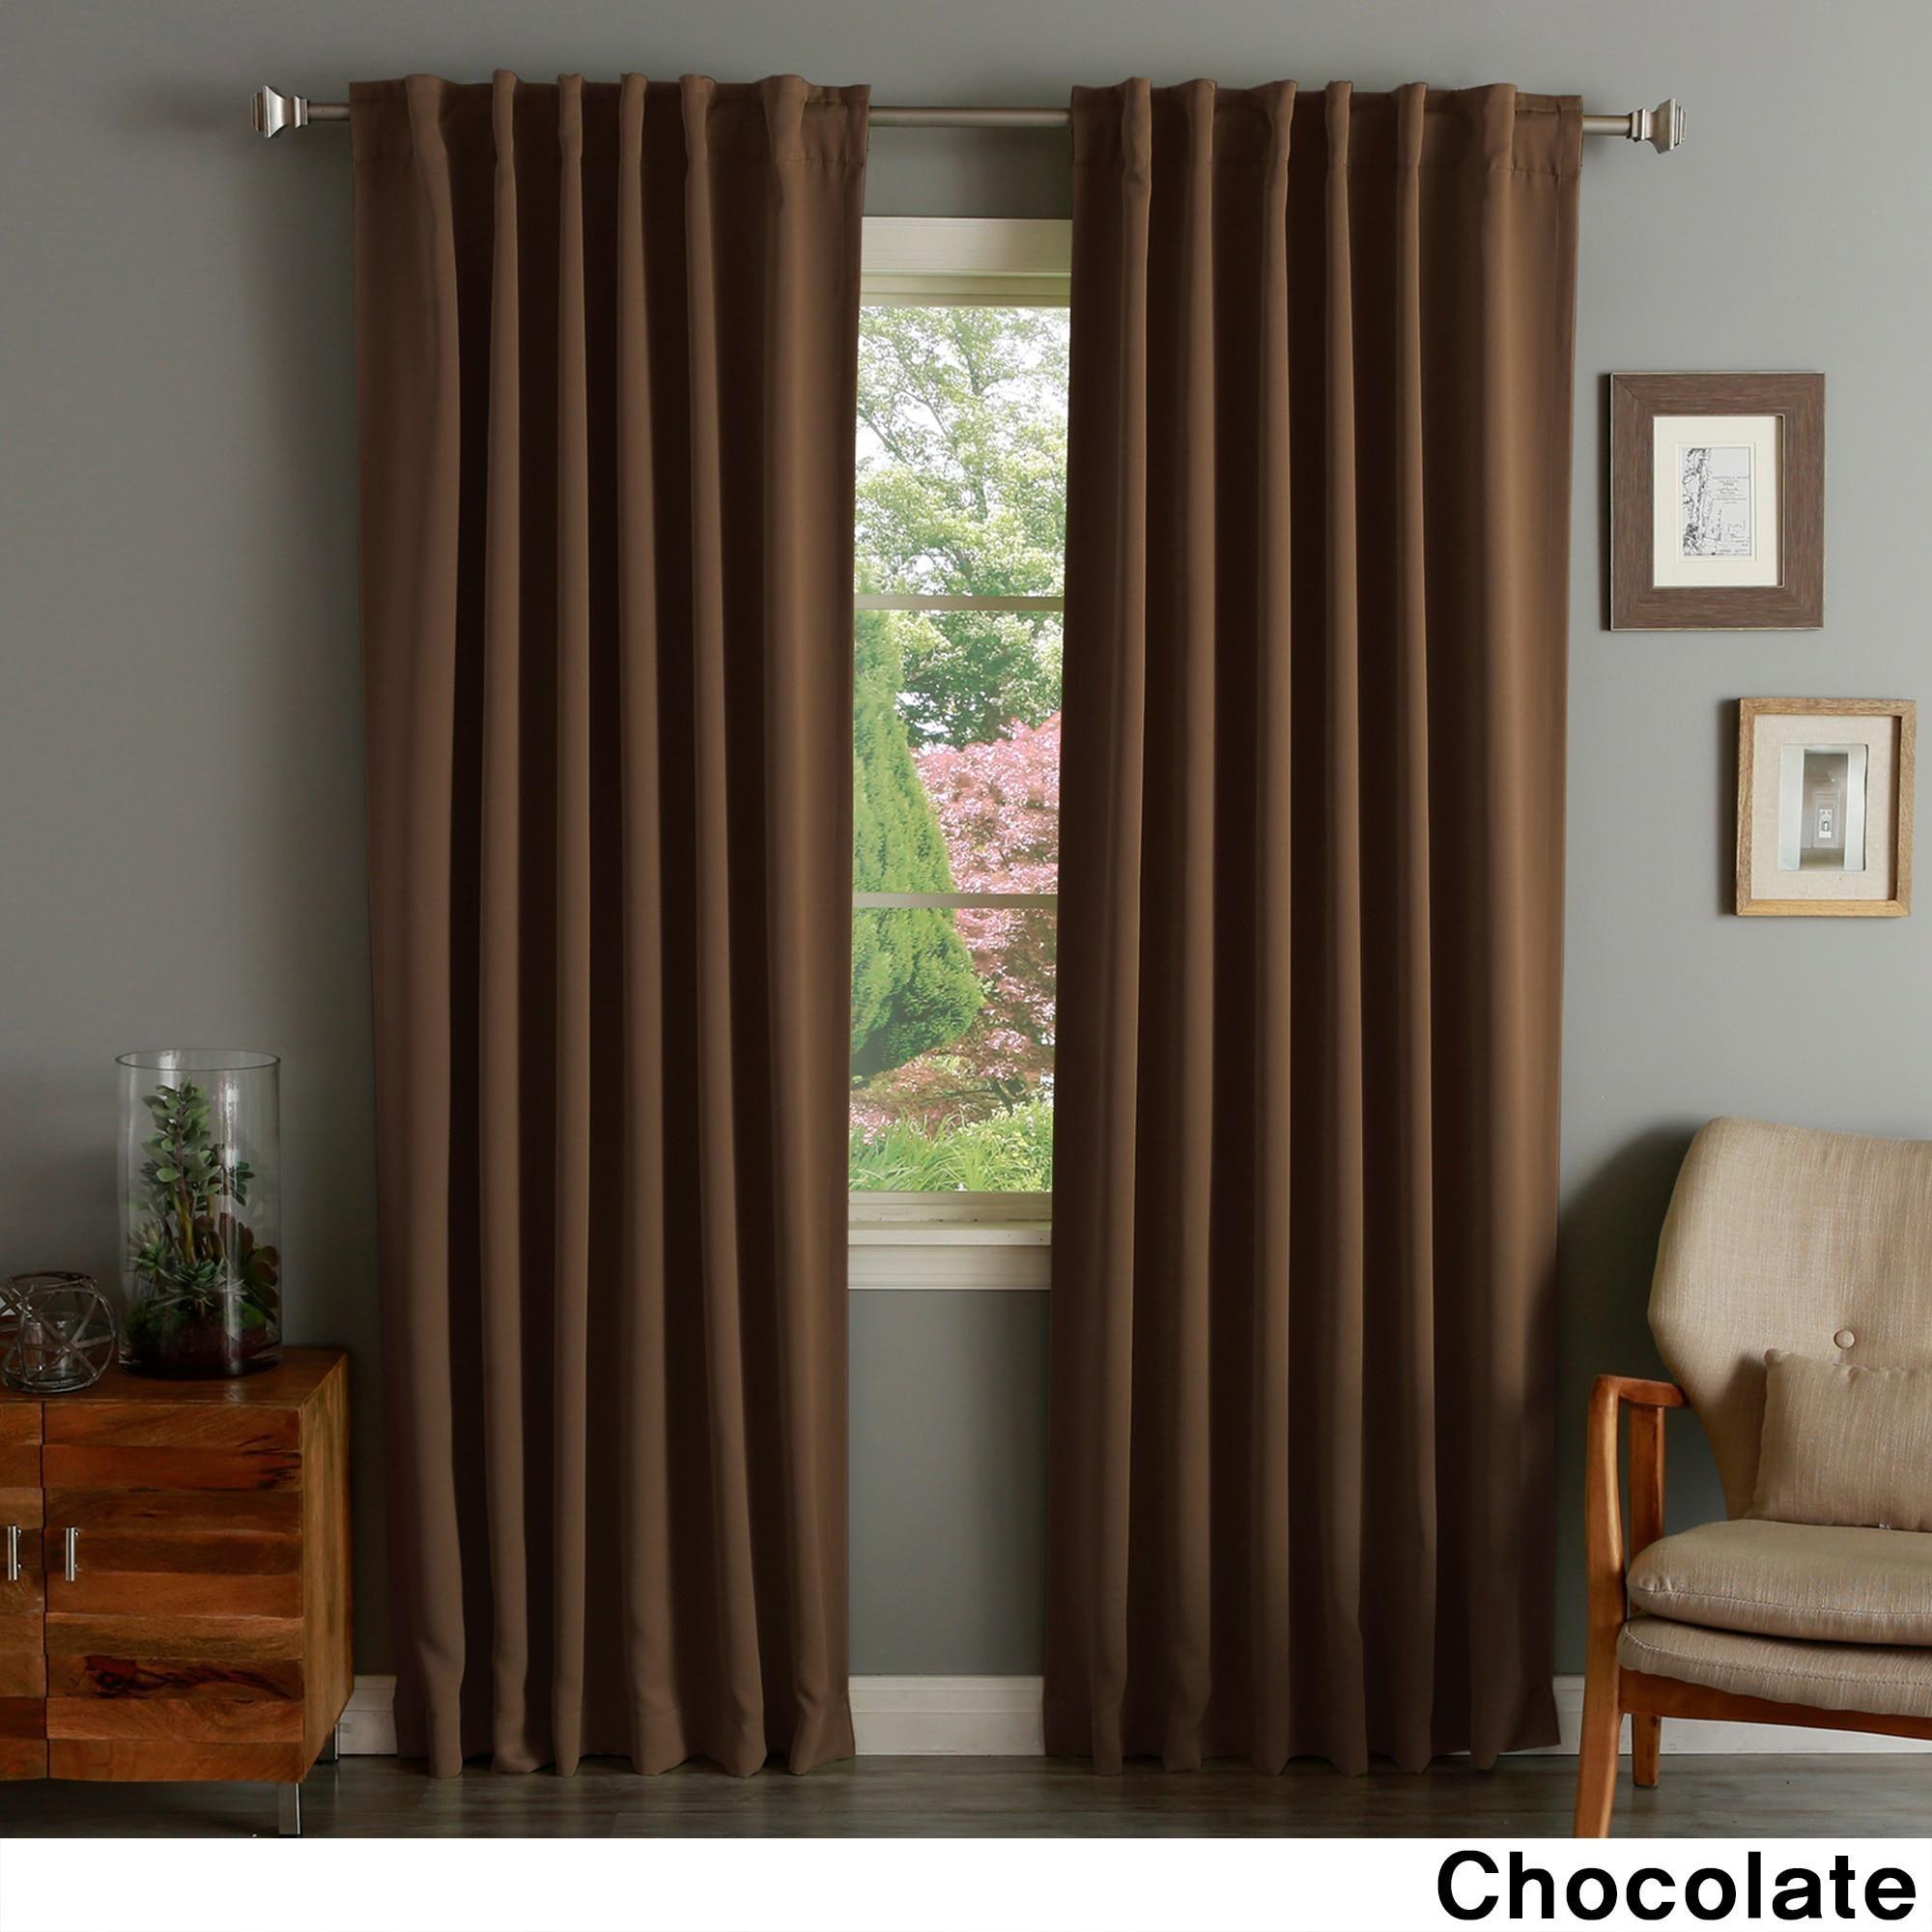 hugad inch en us long ikea white products curtain catalog rod drapes